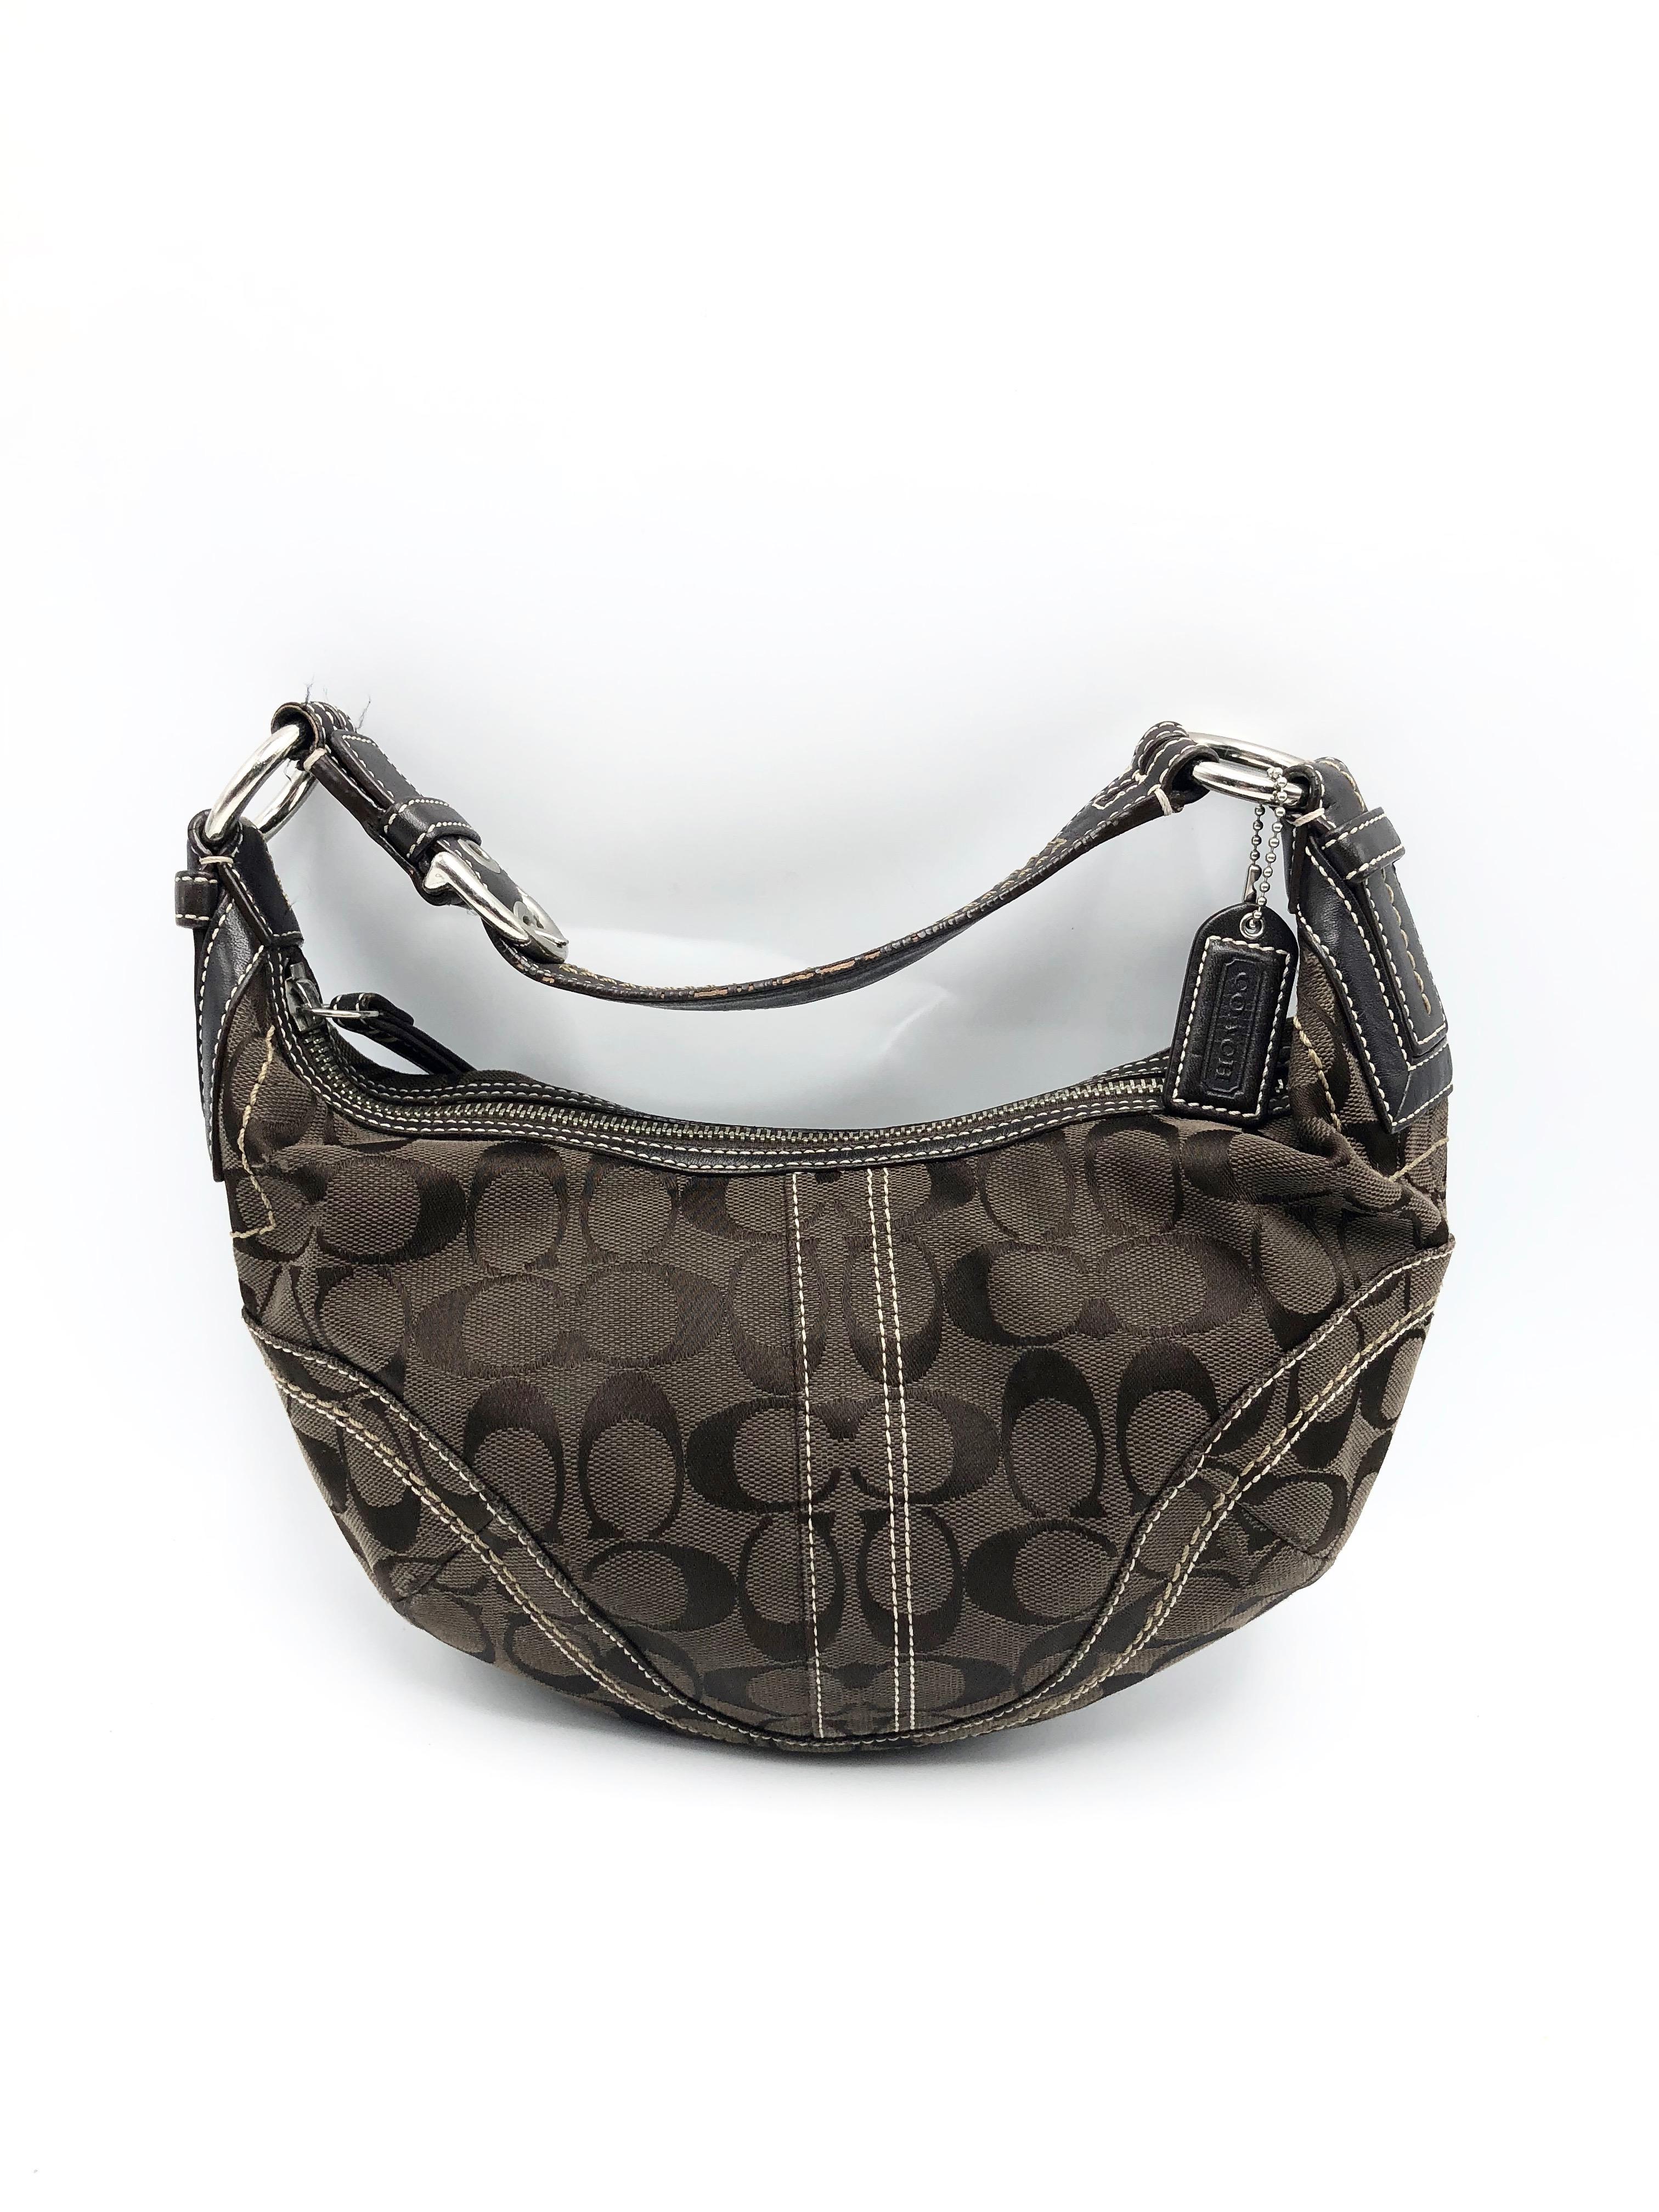 Purse Coach Dark Brown Signature Canvas /& Leather #10073 Small Handbag